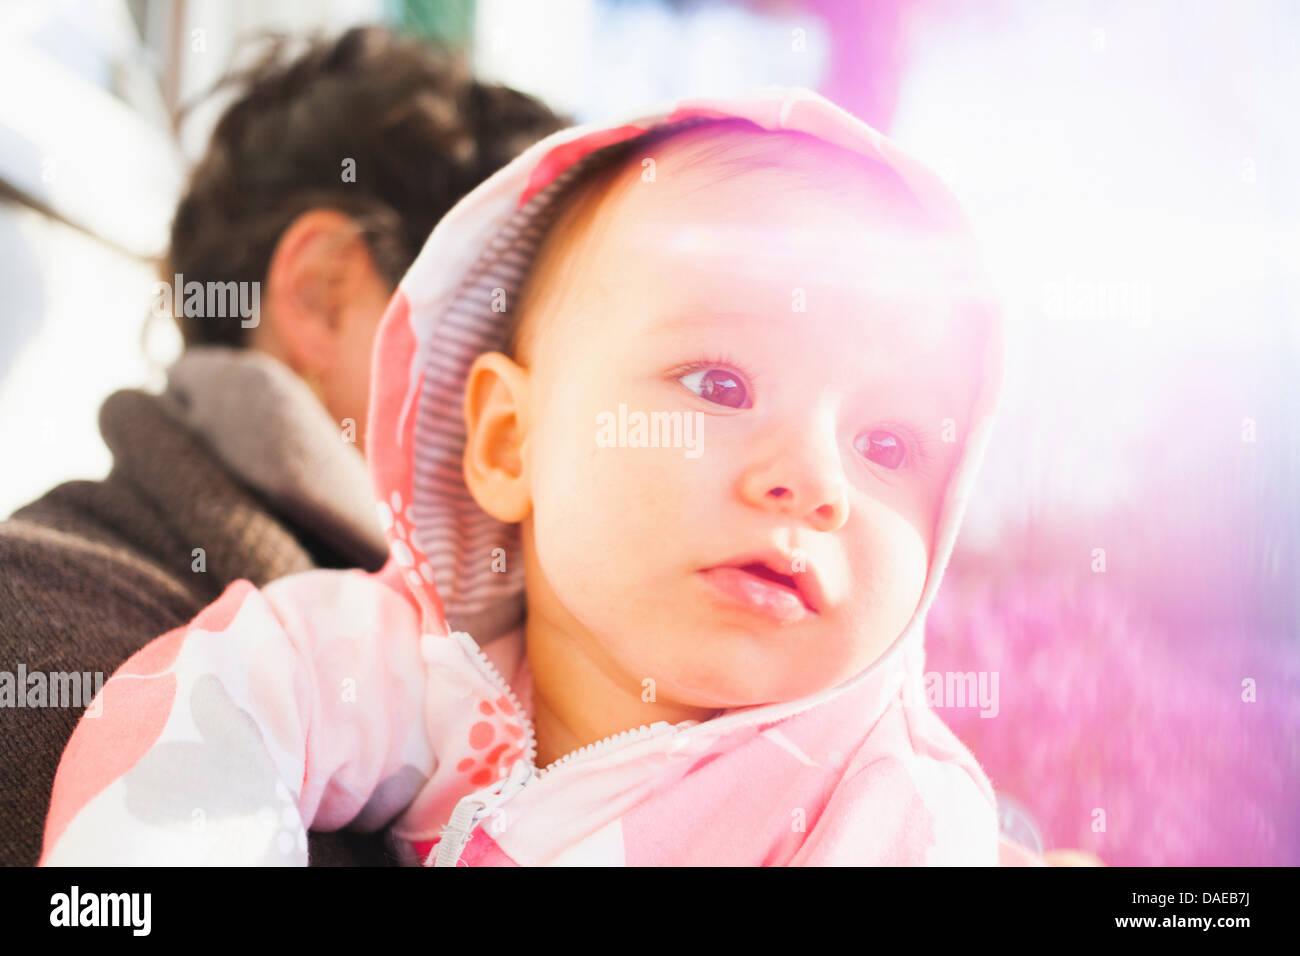 Close Up retrato de niña vestidos de capó Imagen De Stock